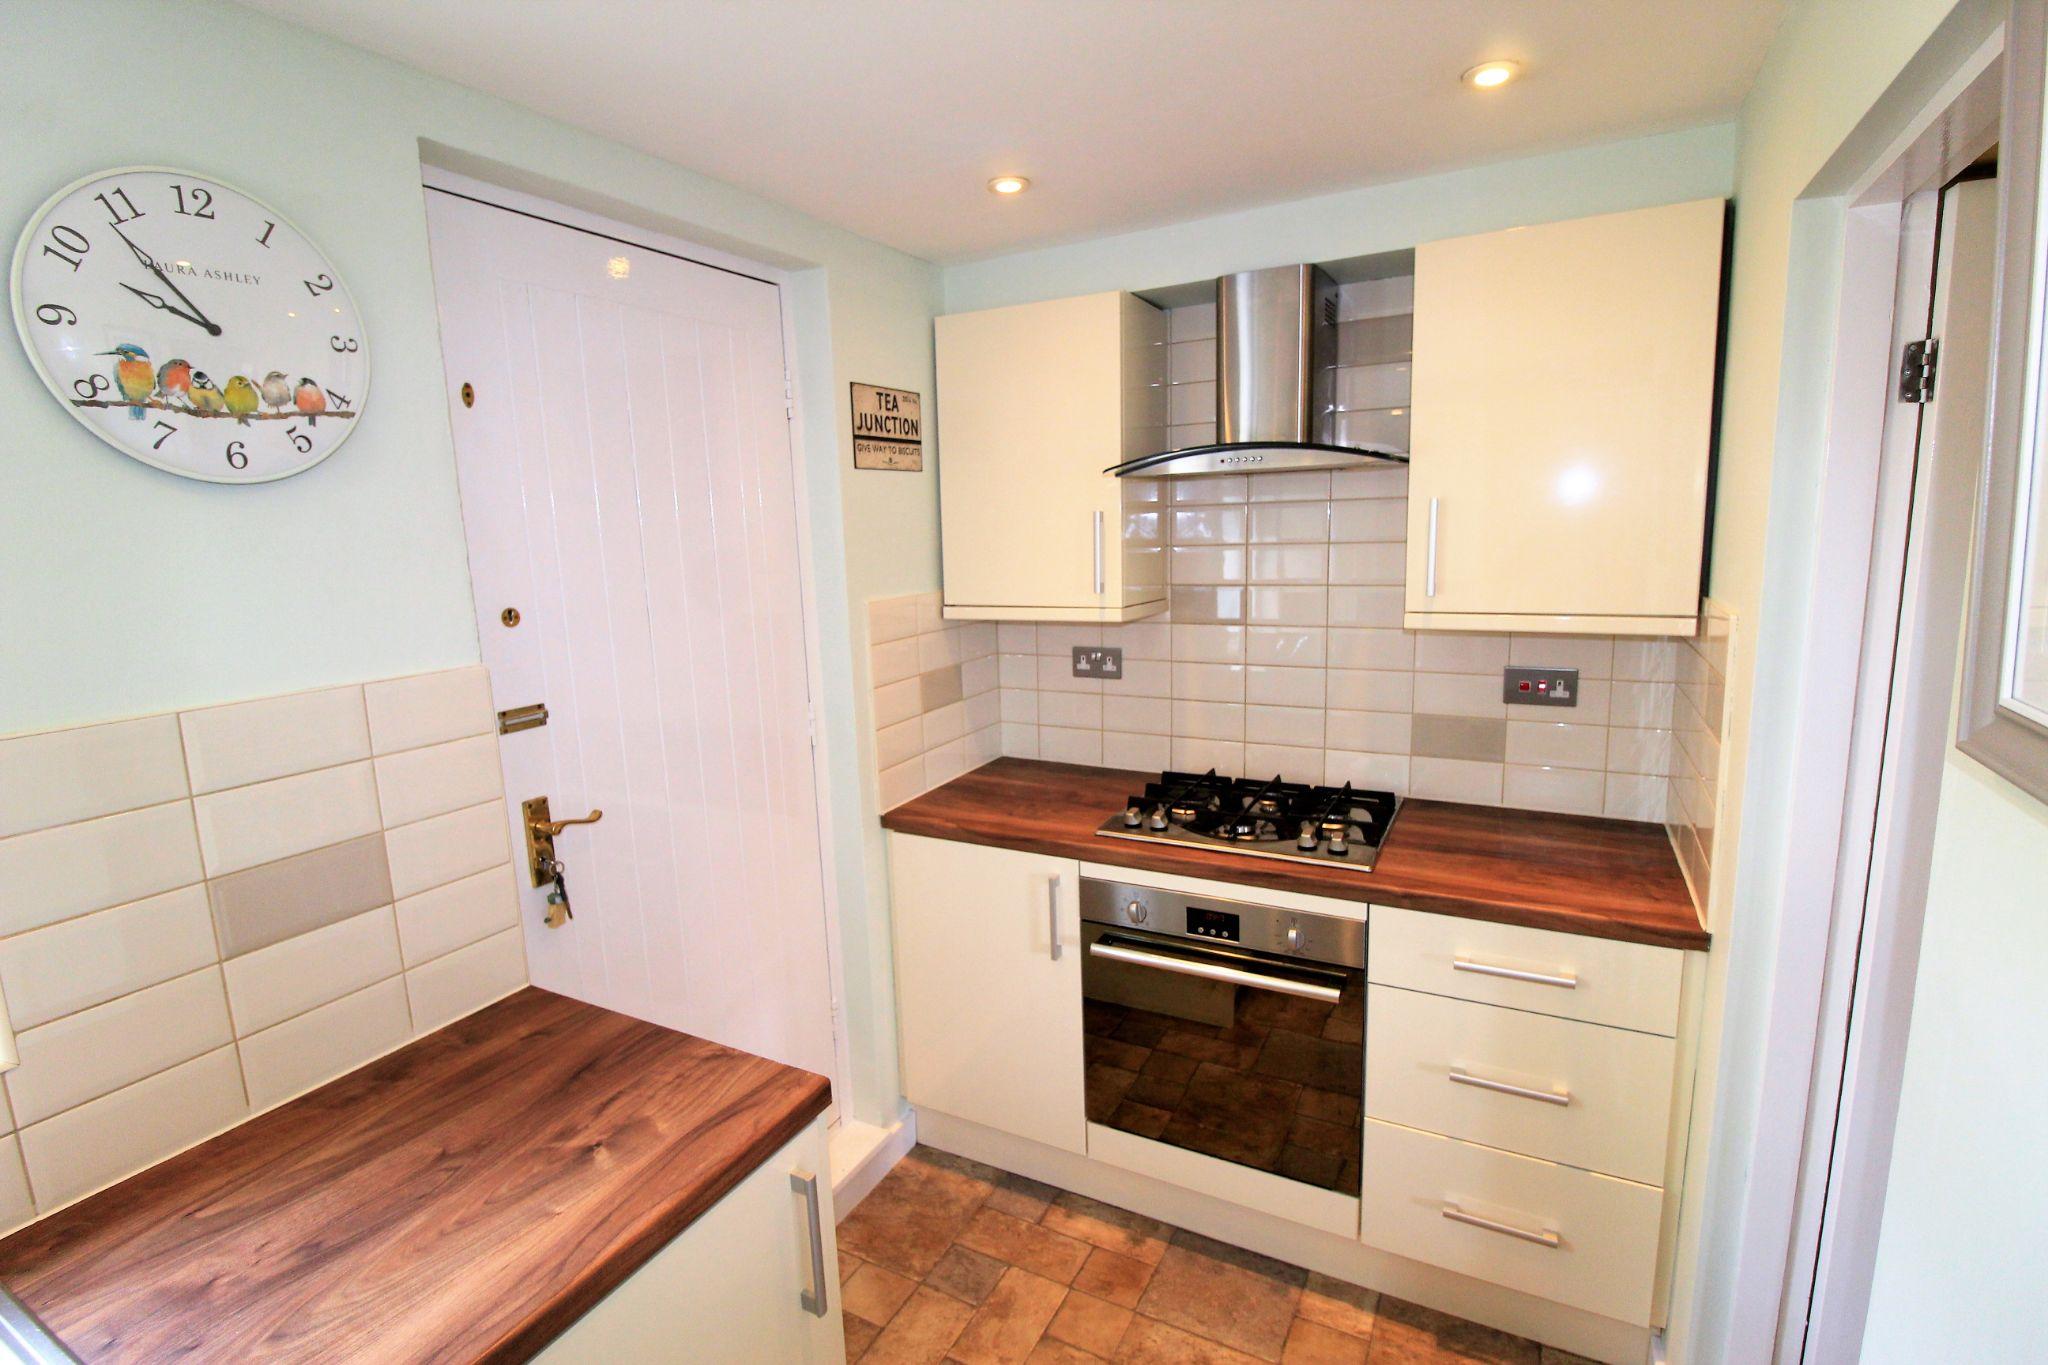 2 bedroom cottage house SSTC in Huddersfield - Kitchen